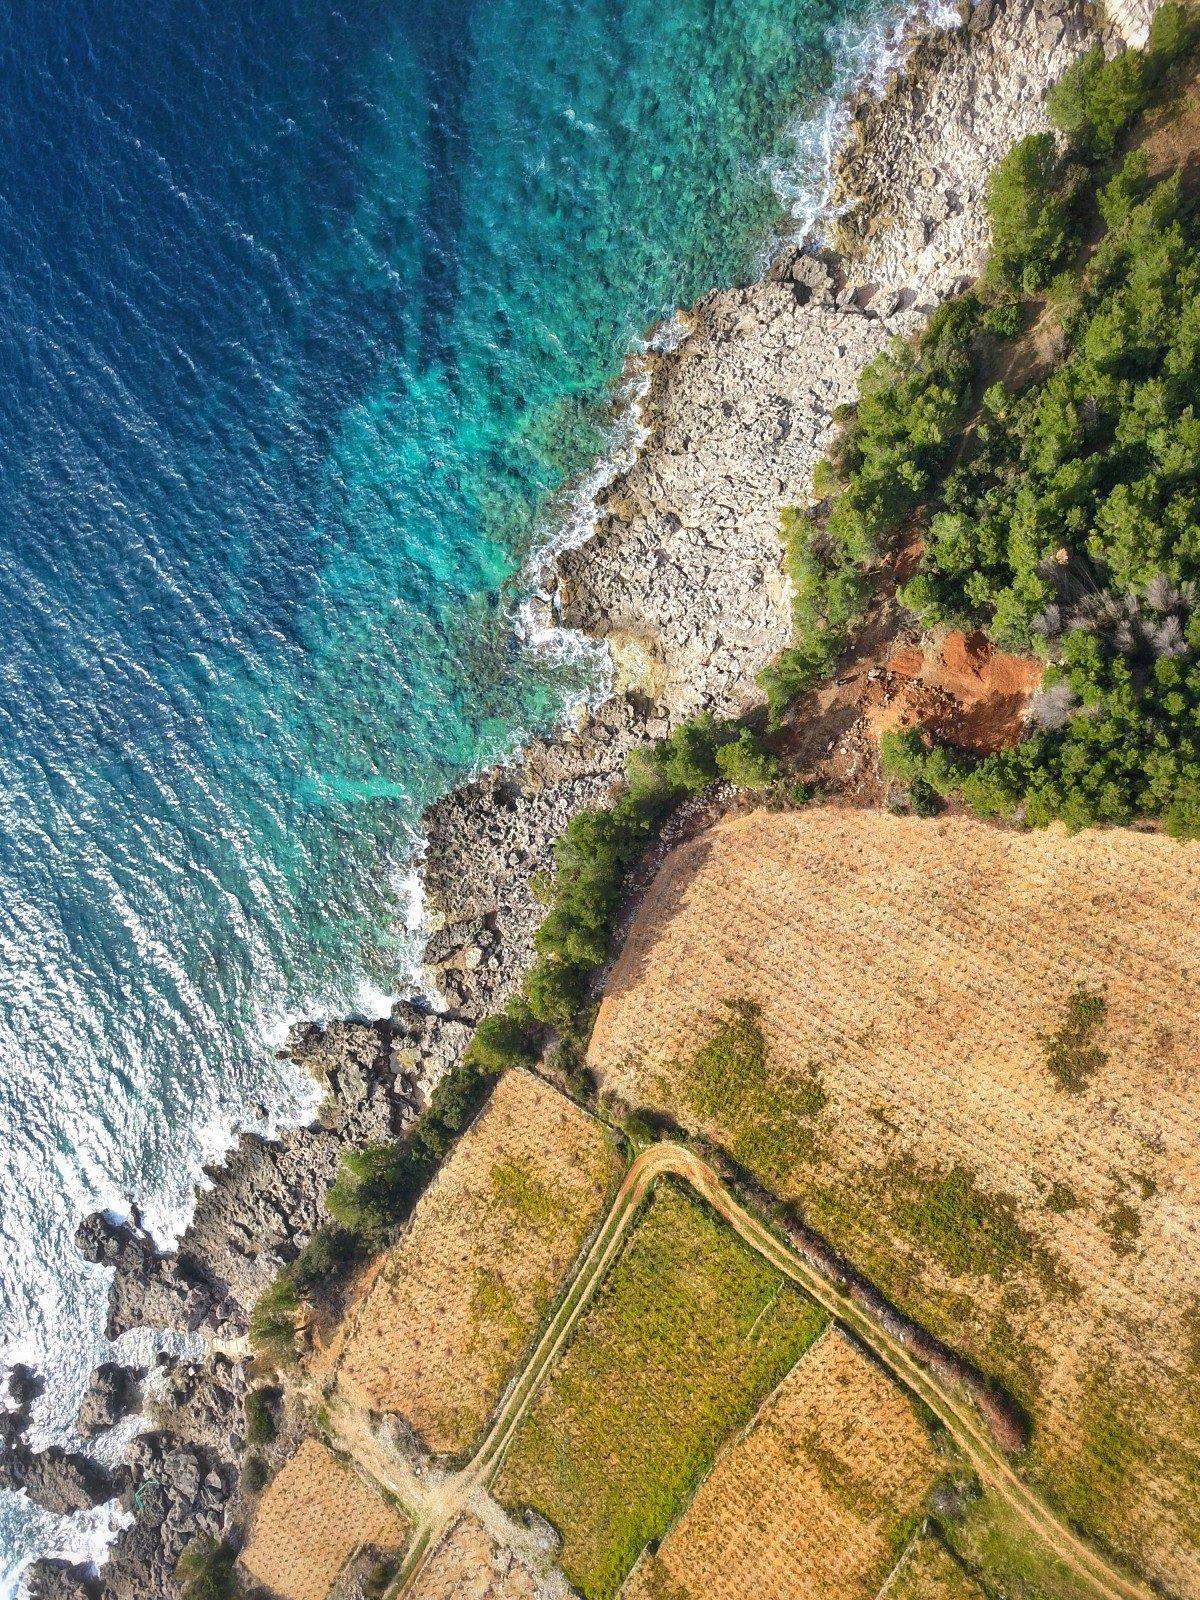 aerial image of the coastline at Pelješac